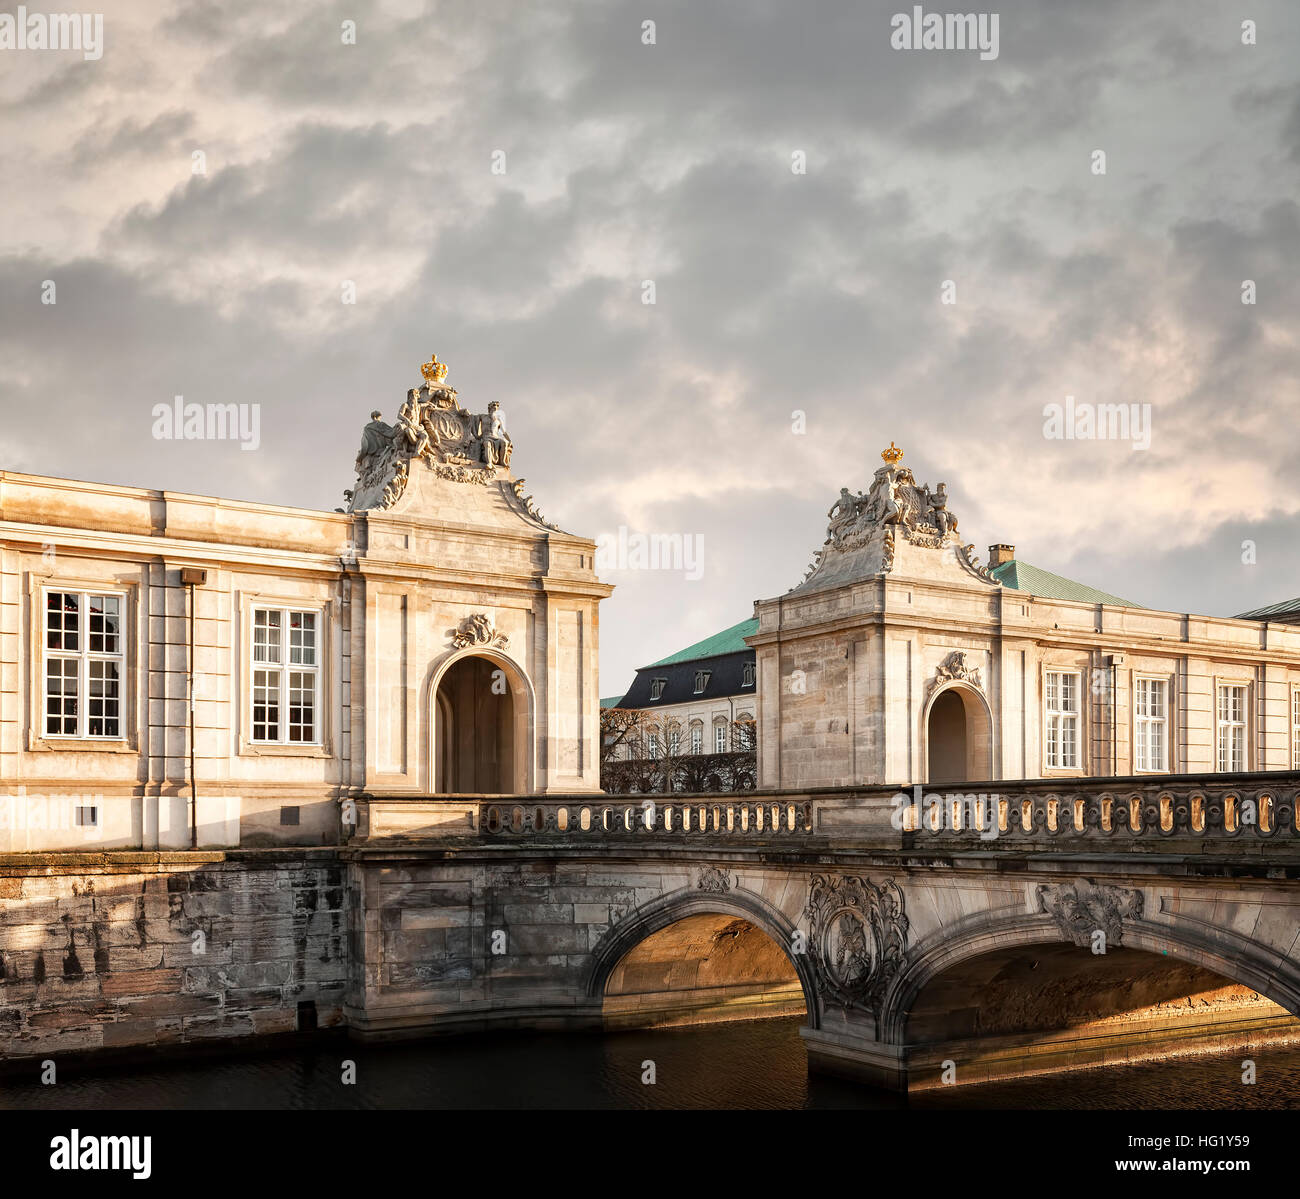 Image of the grand entrance to the castle of Christiansborg in Copenhagen, Denmark. Stock Photo